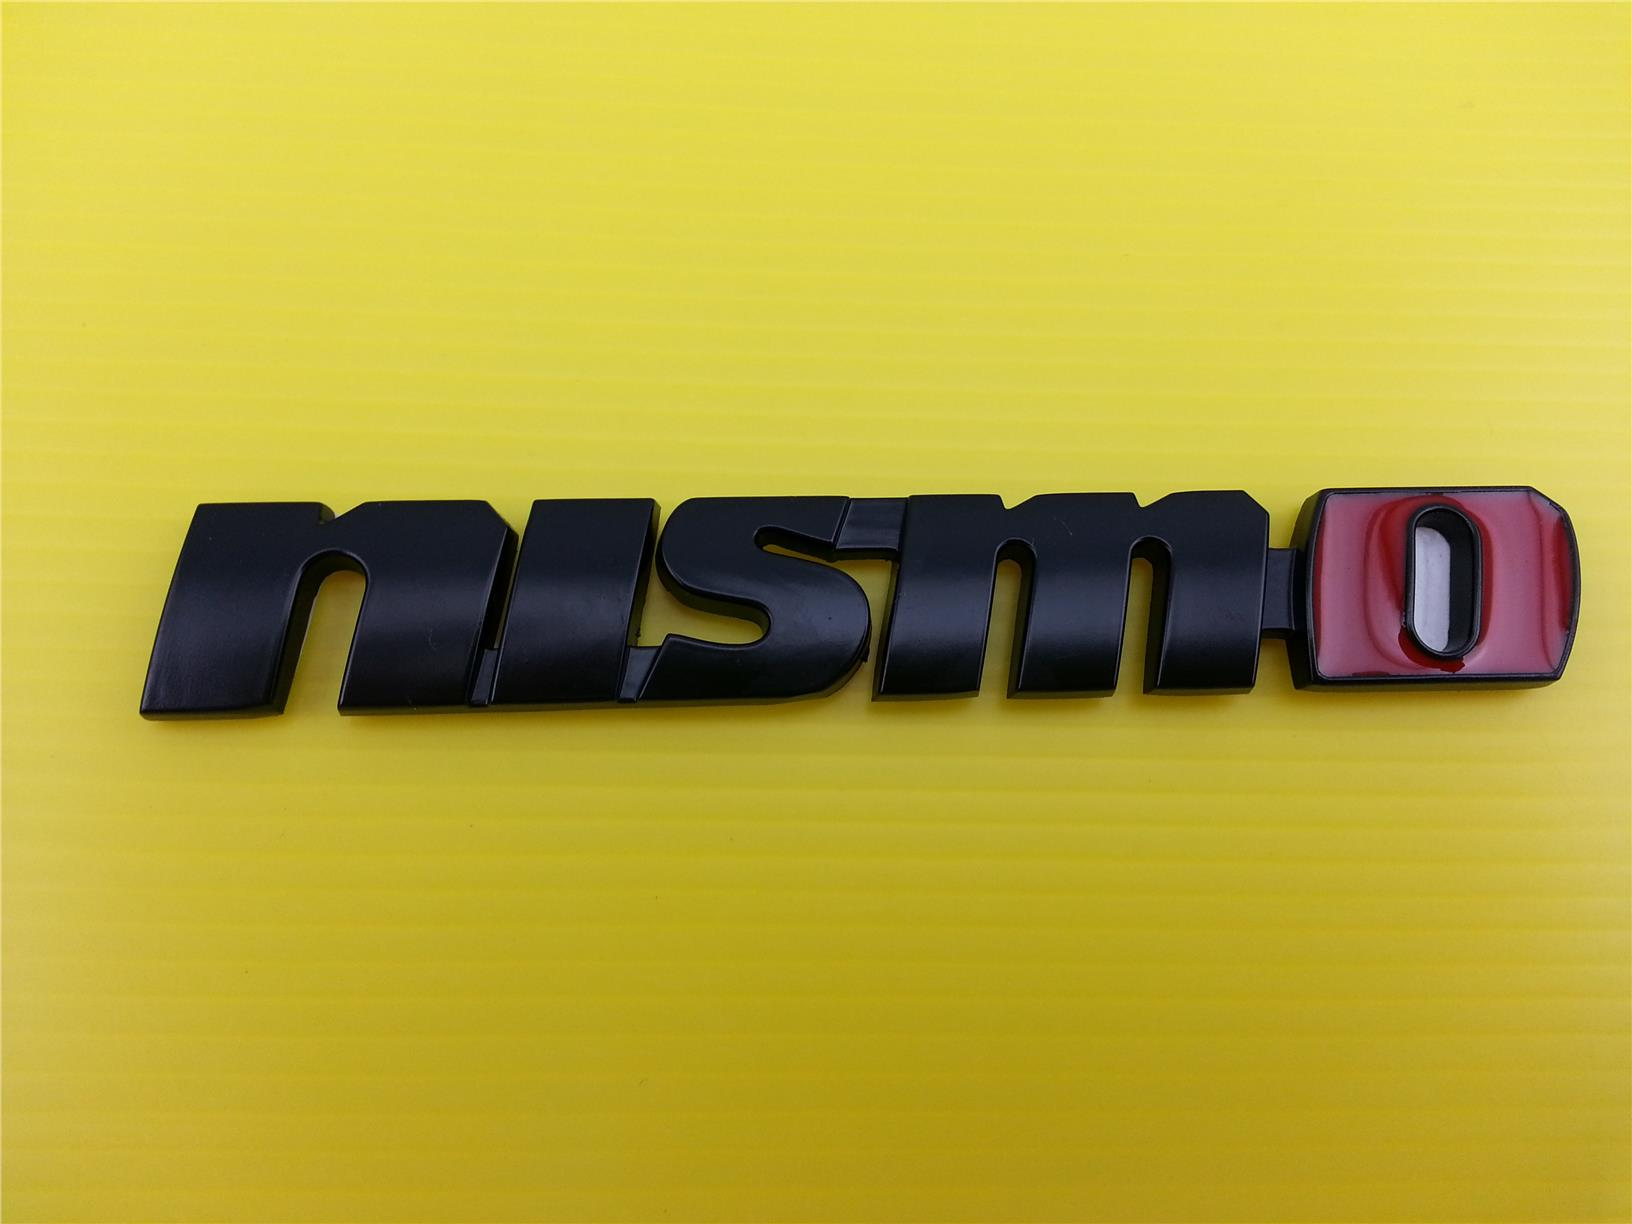 Nismo Emblem High Quality Metal Emblem by Nismo